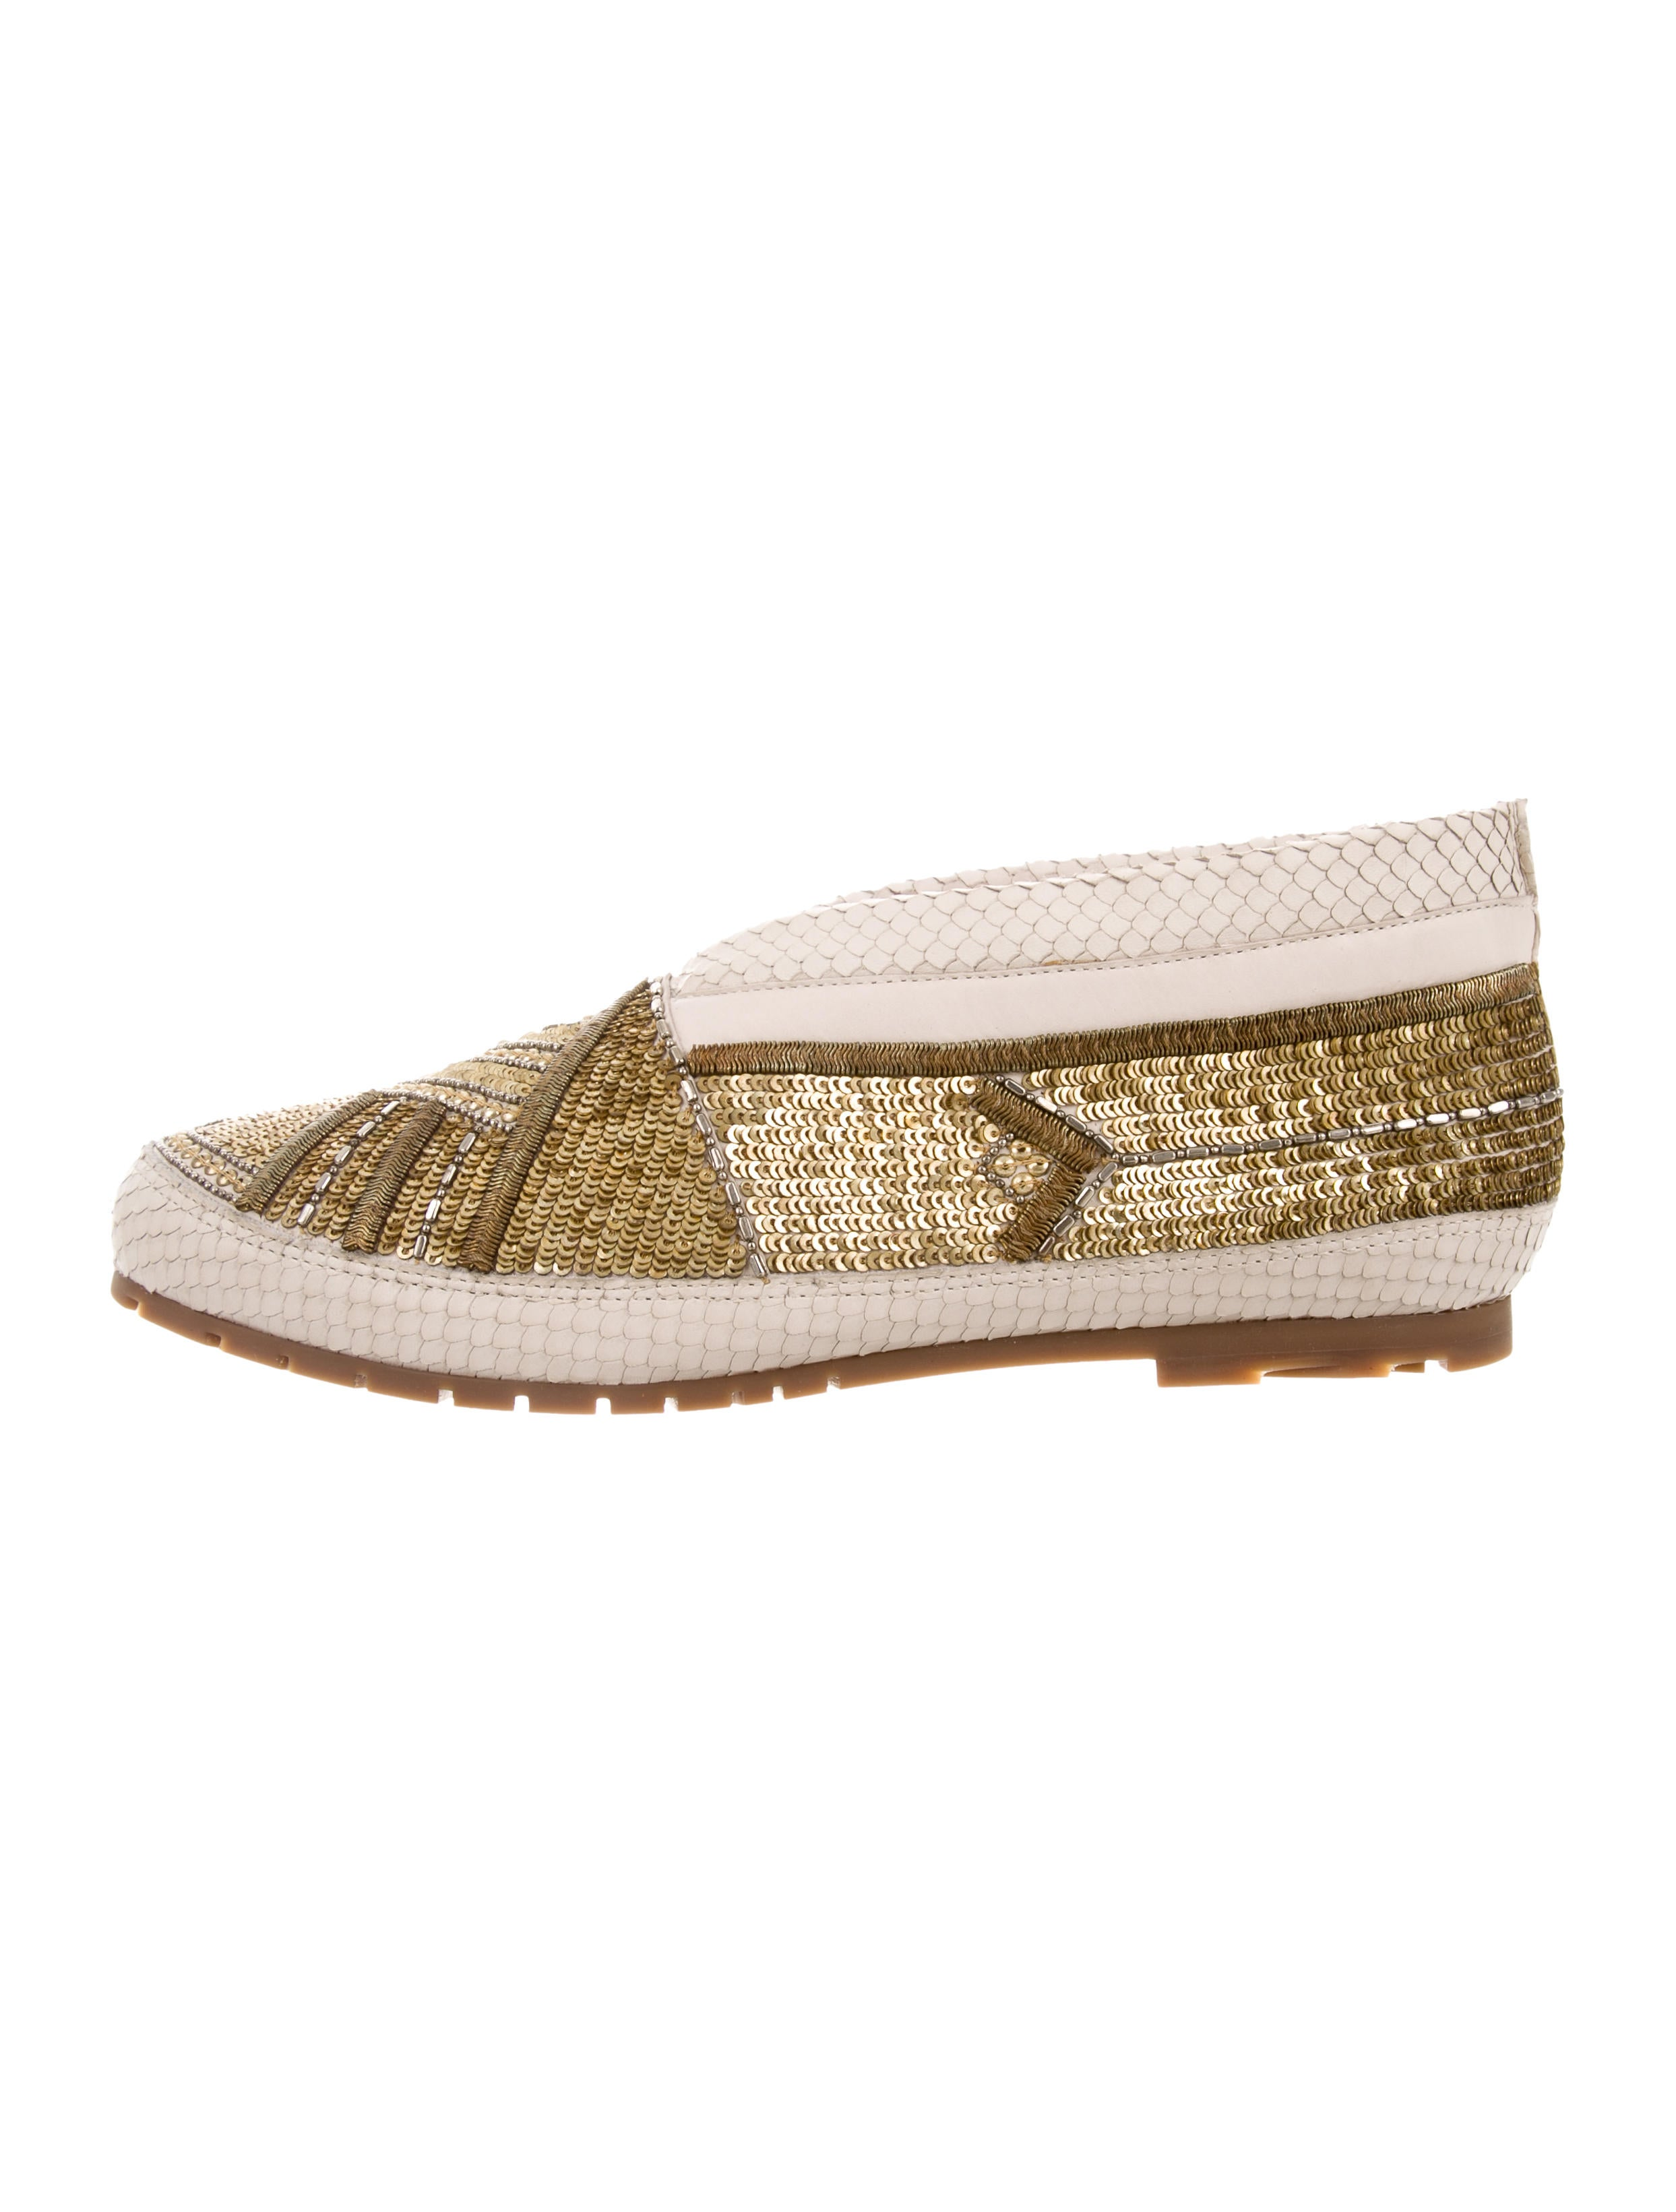 Femmes Sans Peur 2017 Faye Python Moccasins w/ Tags nicekicks cheap online buy cheap footlocker great deals online Zdhj6D